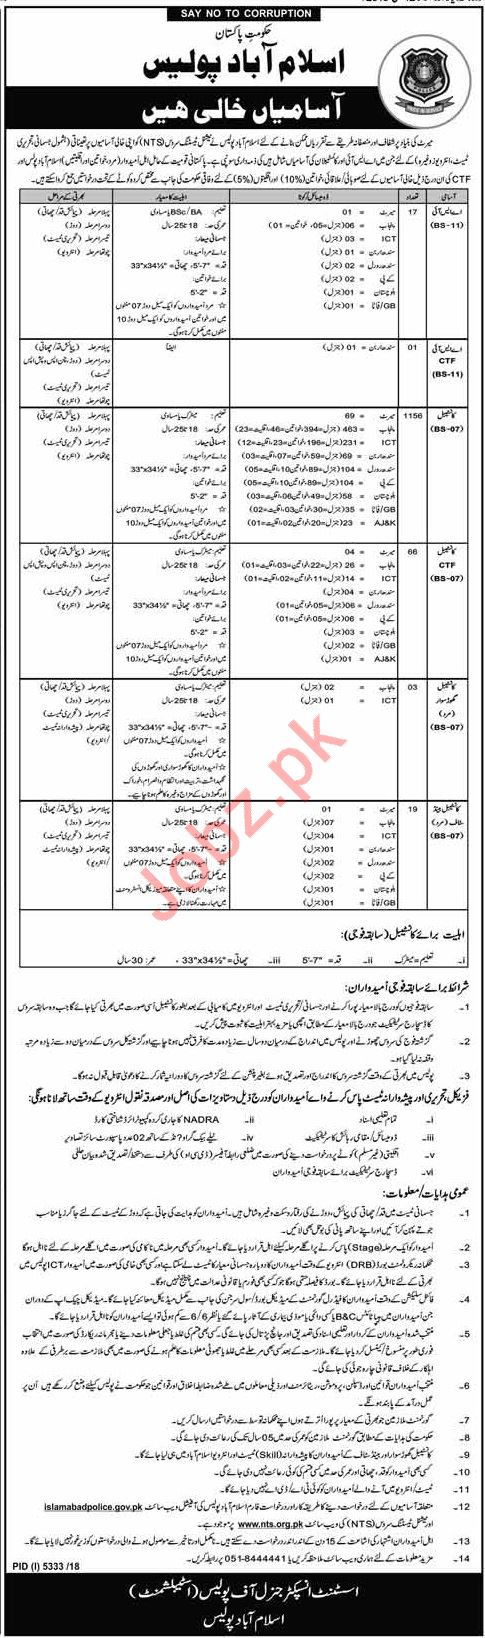 Islamabad Capital Territory Police ASI Jobs 2019 Via NTS